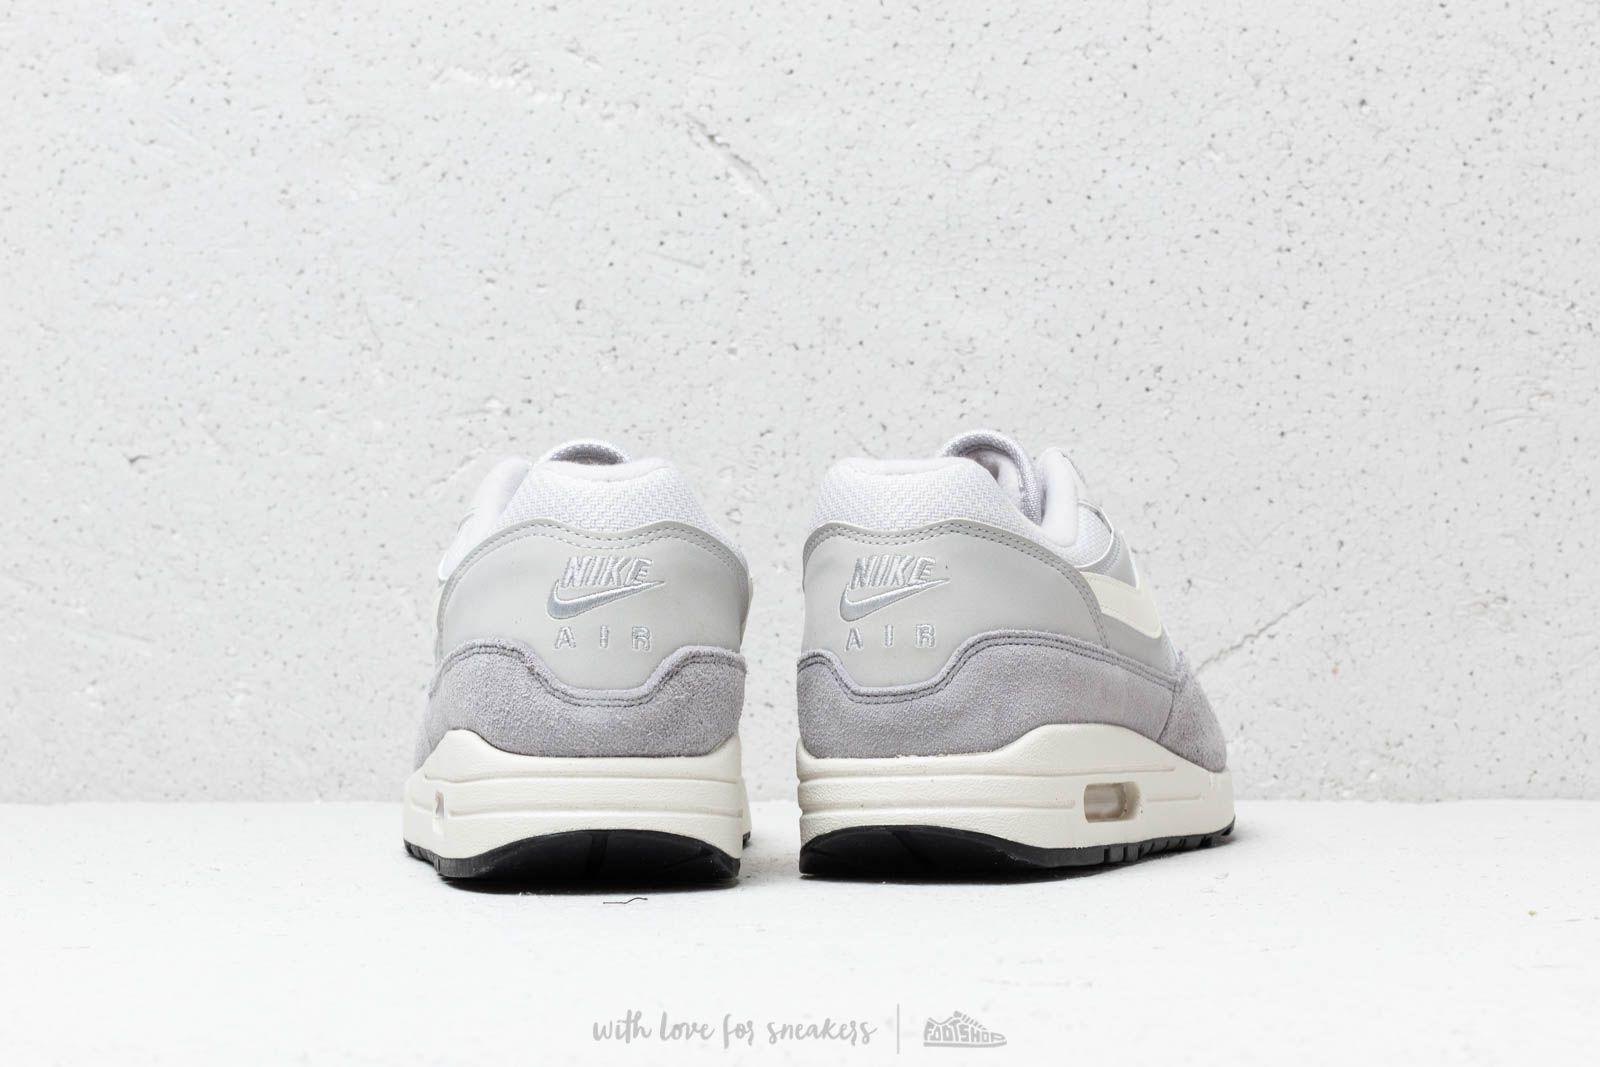 Nike Air Max 1 Vast Grey Sail Sail Wolf Grey   Footshop